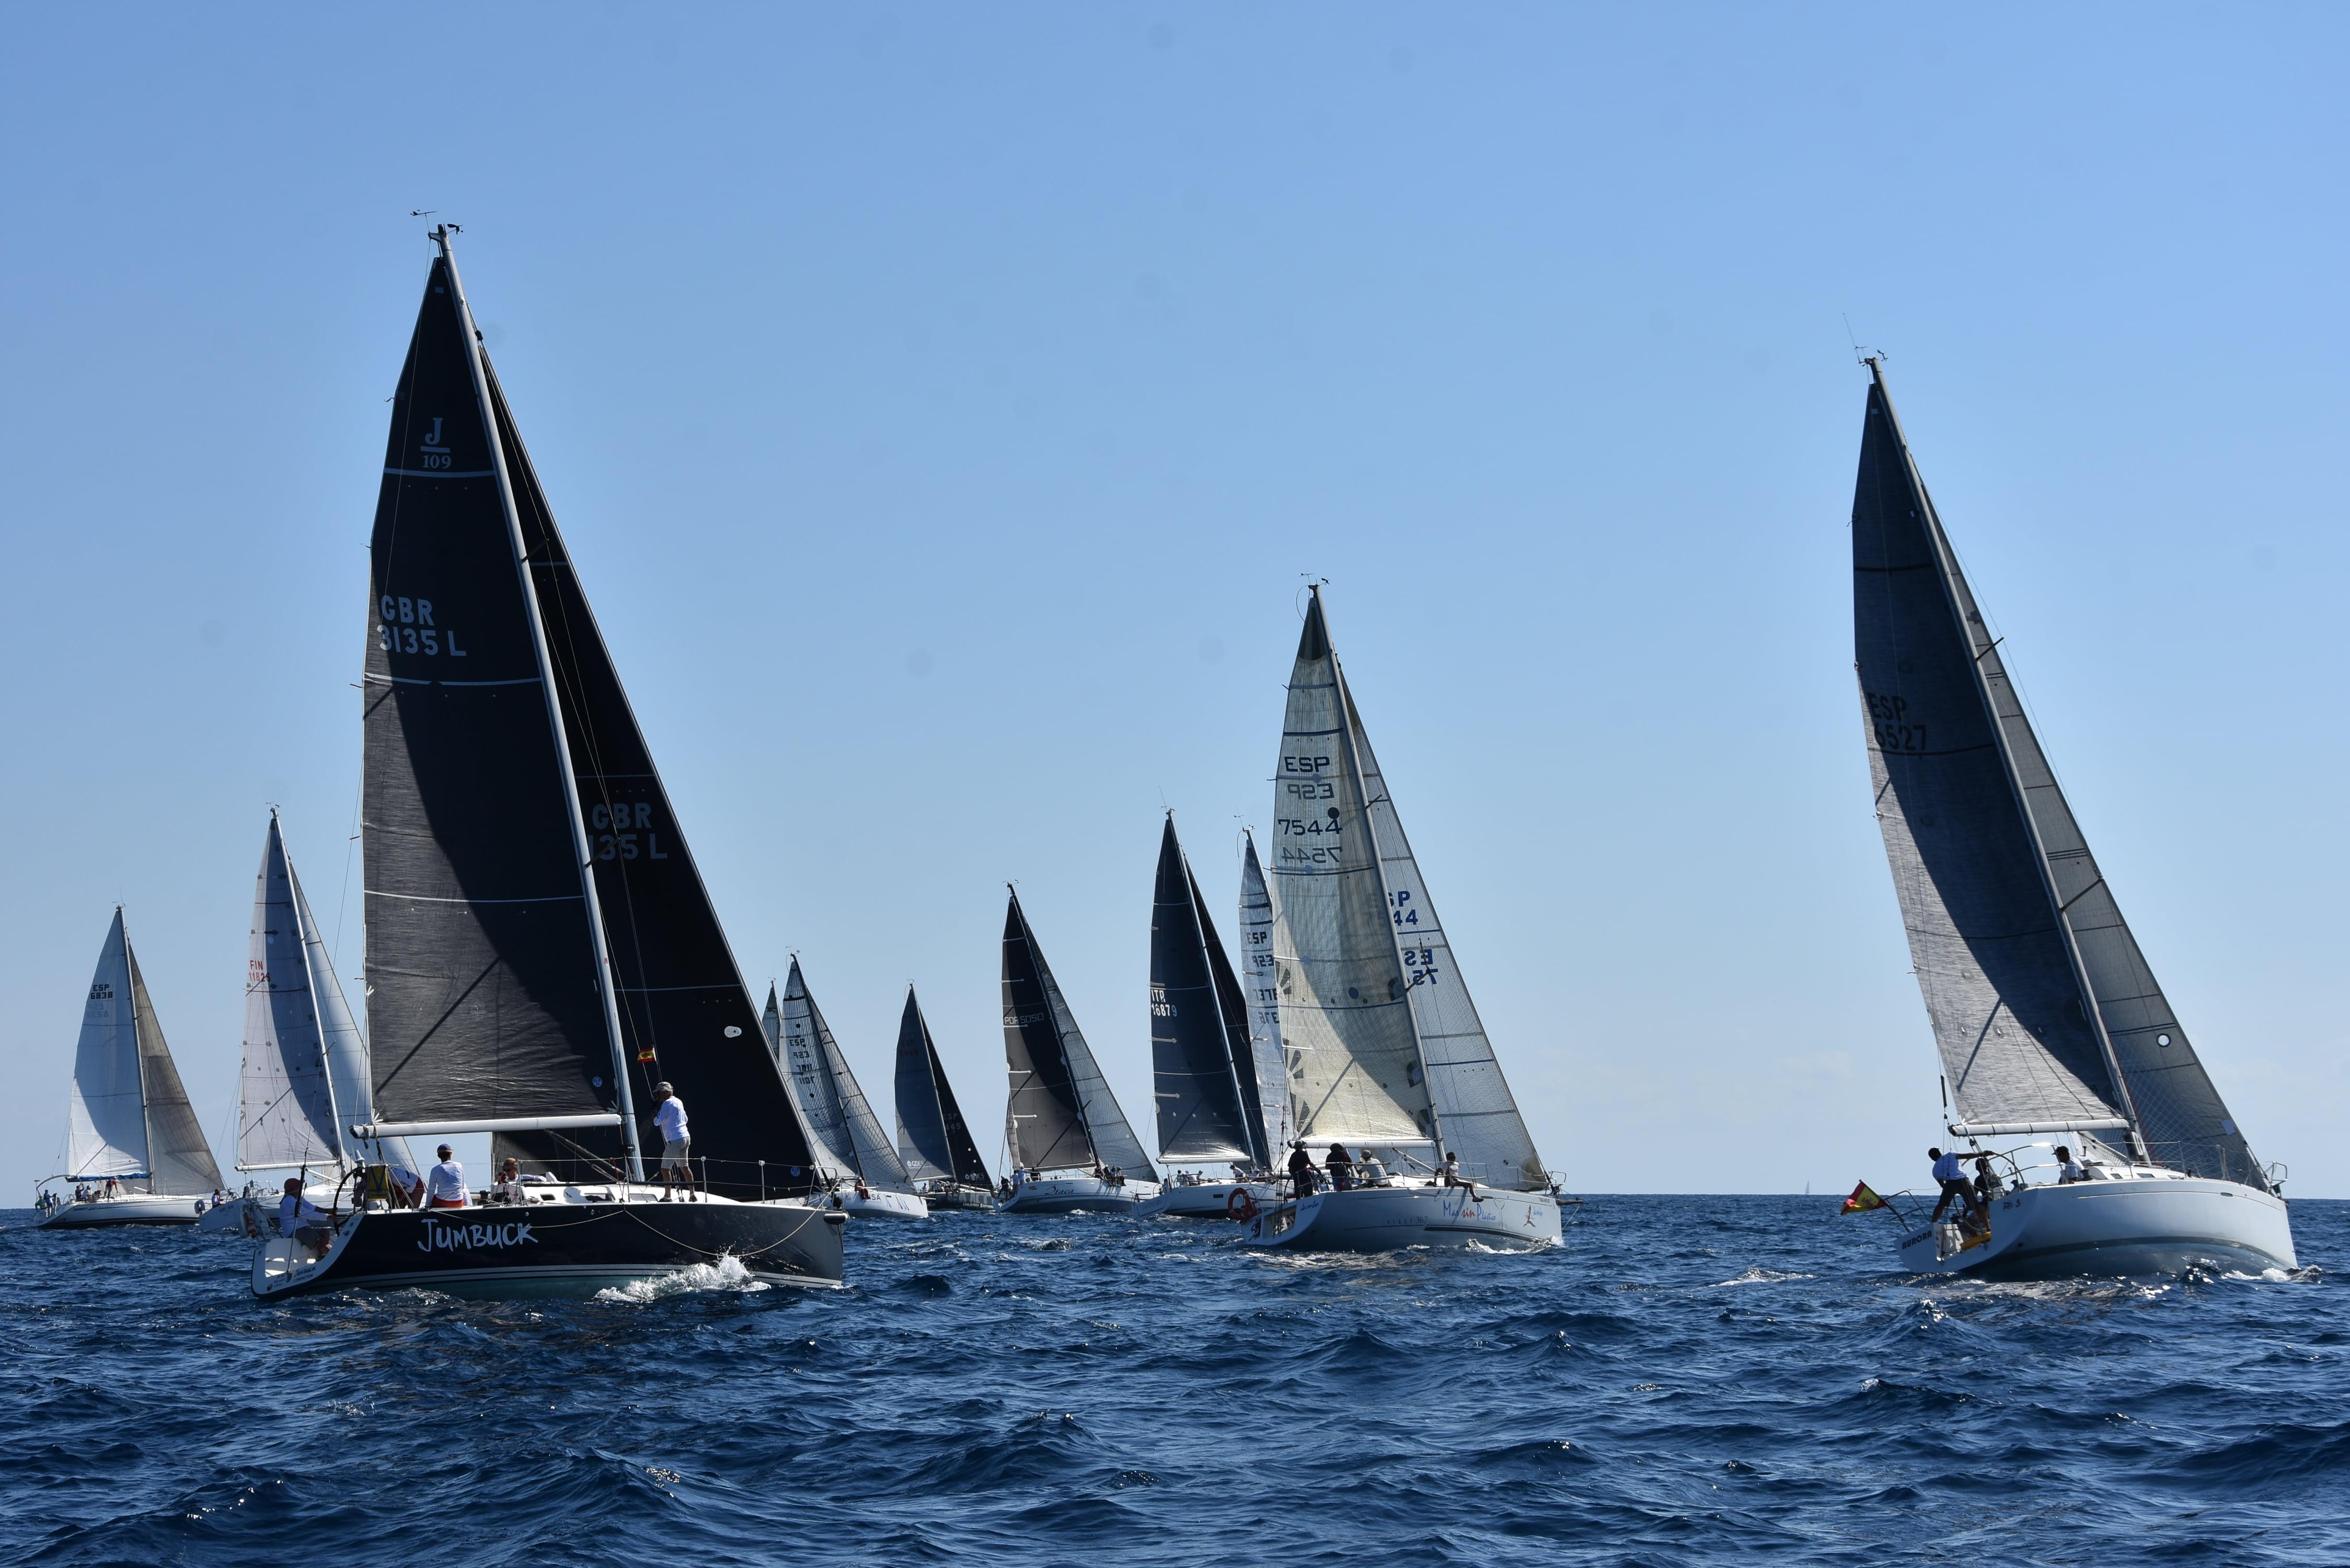 The 'Jeffertje' ships of RCN Calpe and 'Náutic Café del Mar